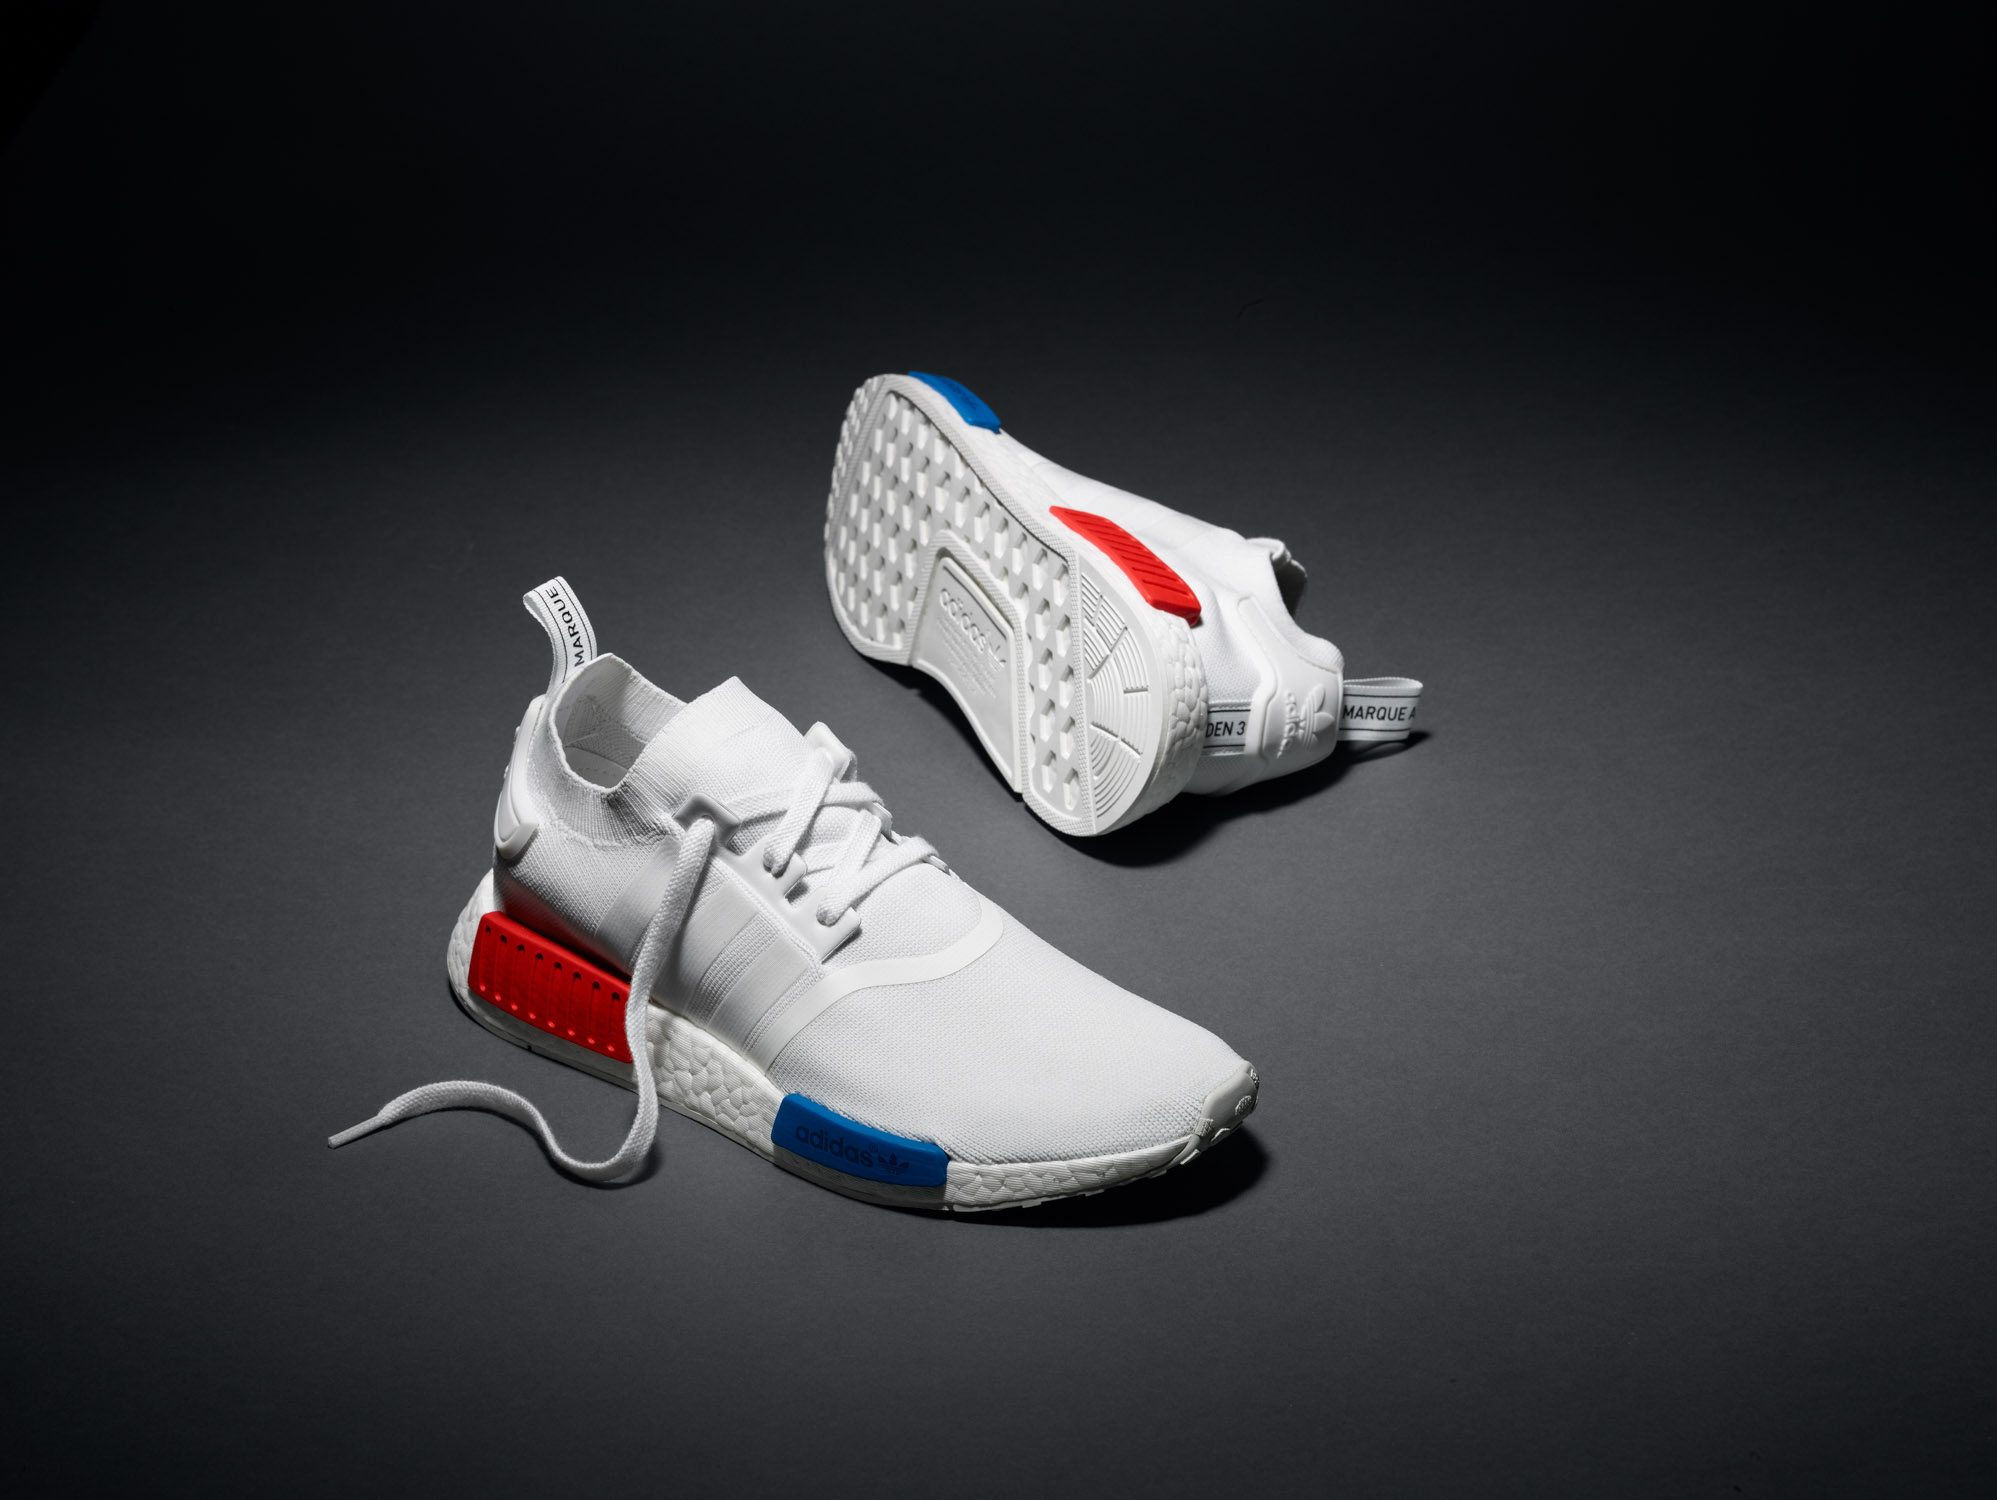 adidas NMD Primeknit White OG 2